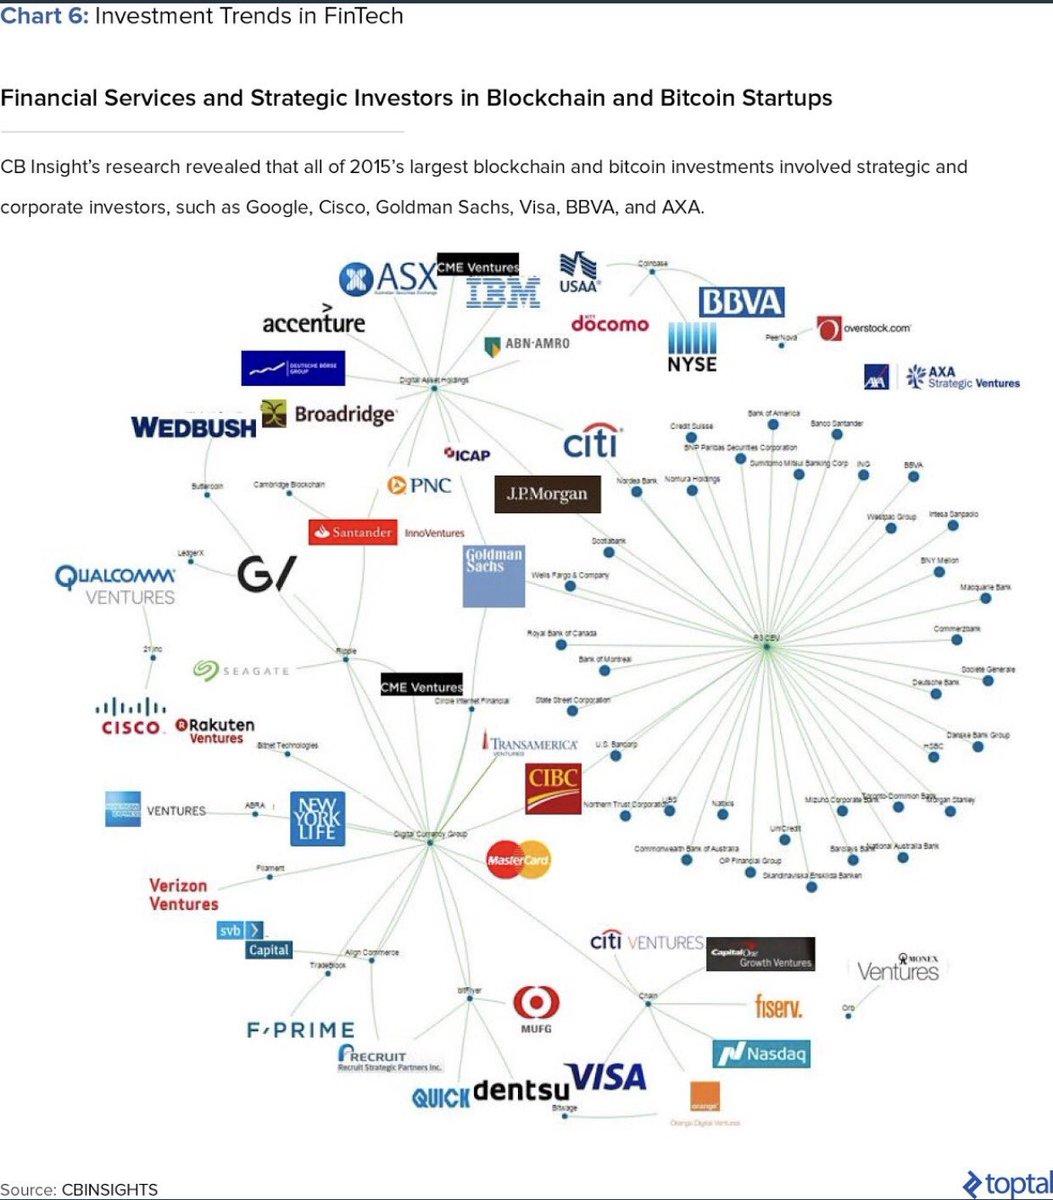 State of #fintech 2017.  #IoT #tech #banking #blockchain #bigdata #disruption #machinelearning #crypto #vt #SmartCity #btc $btc #insurtech<br>http://pic.twitter.com/KRamgNvDMa